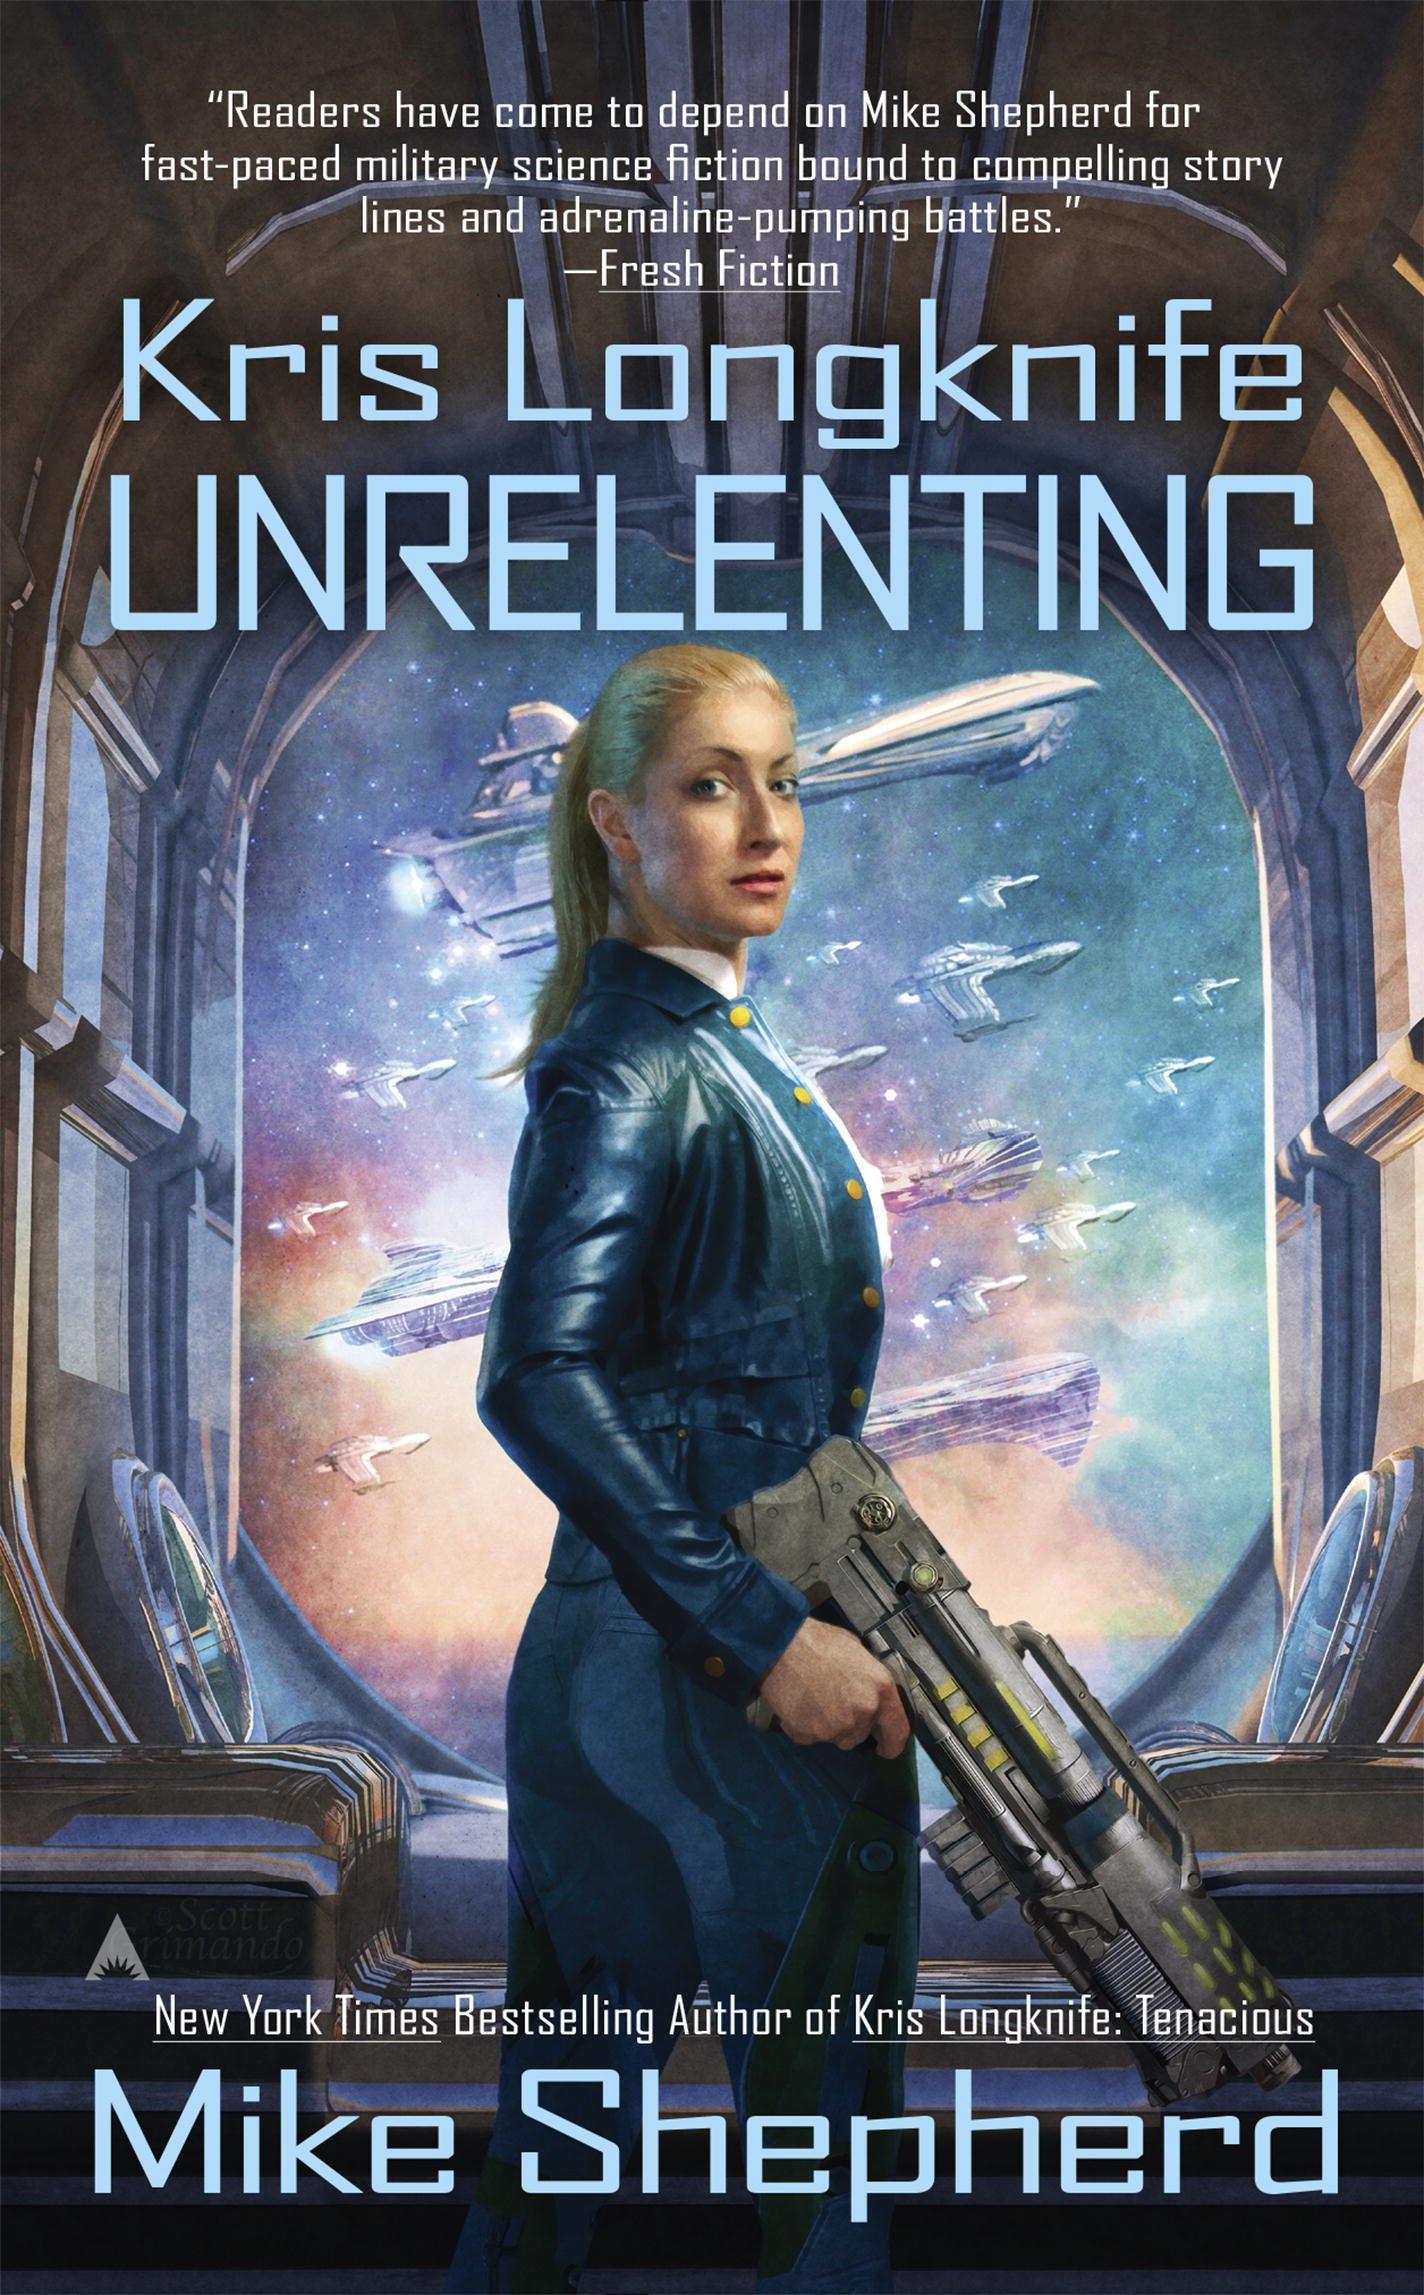 Kris Longknife 13 - Unrelenting - Mike Shepherd